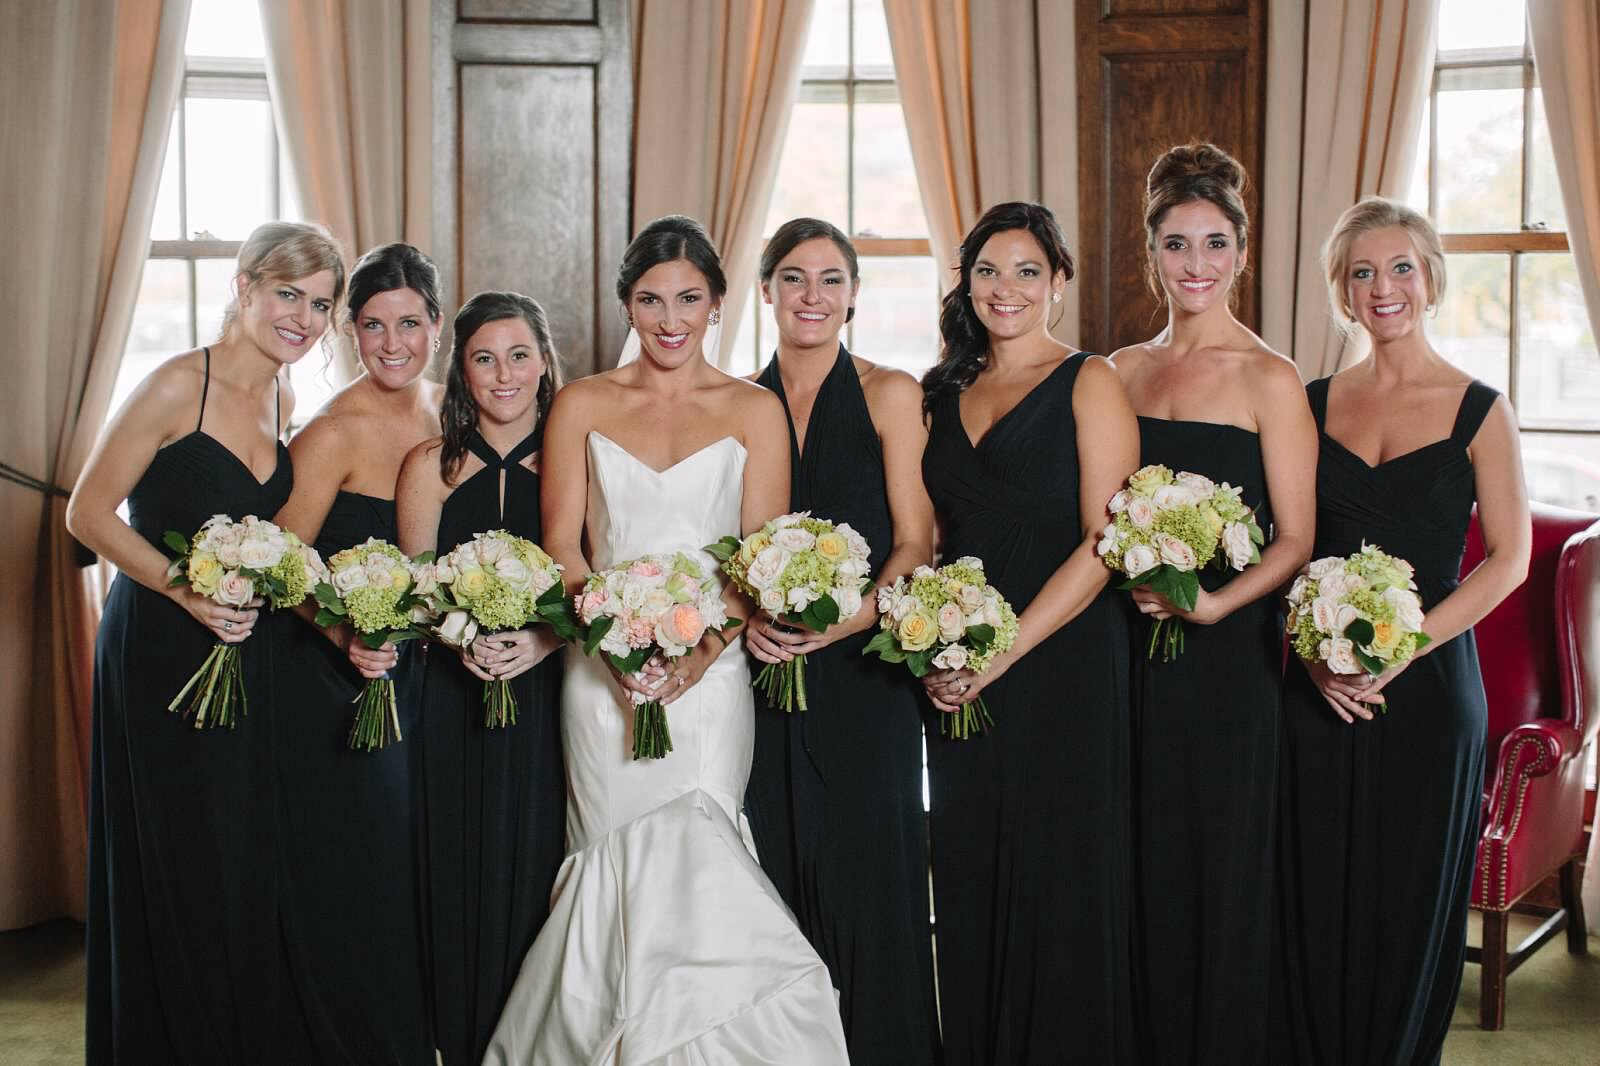 Our bella bridesmaids bella bridesmaids chicago ombrellifo Images